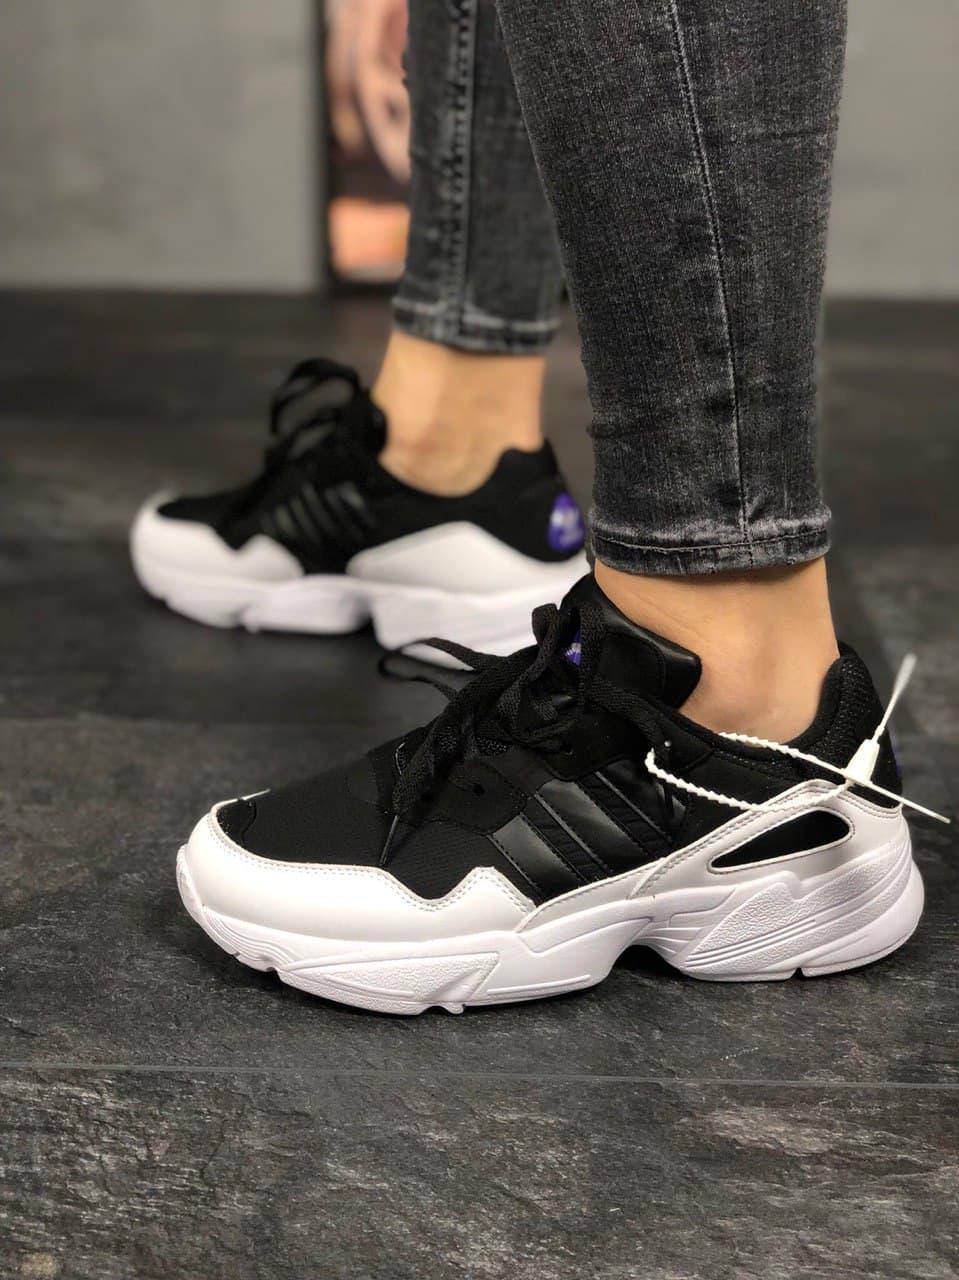 Жіночі Кросівки  Adidas Yung 96 Black White